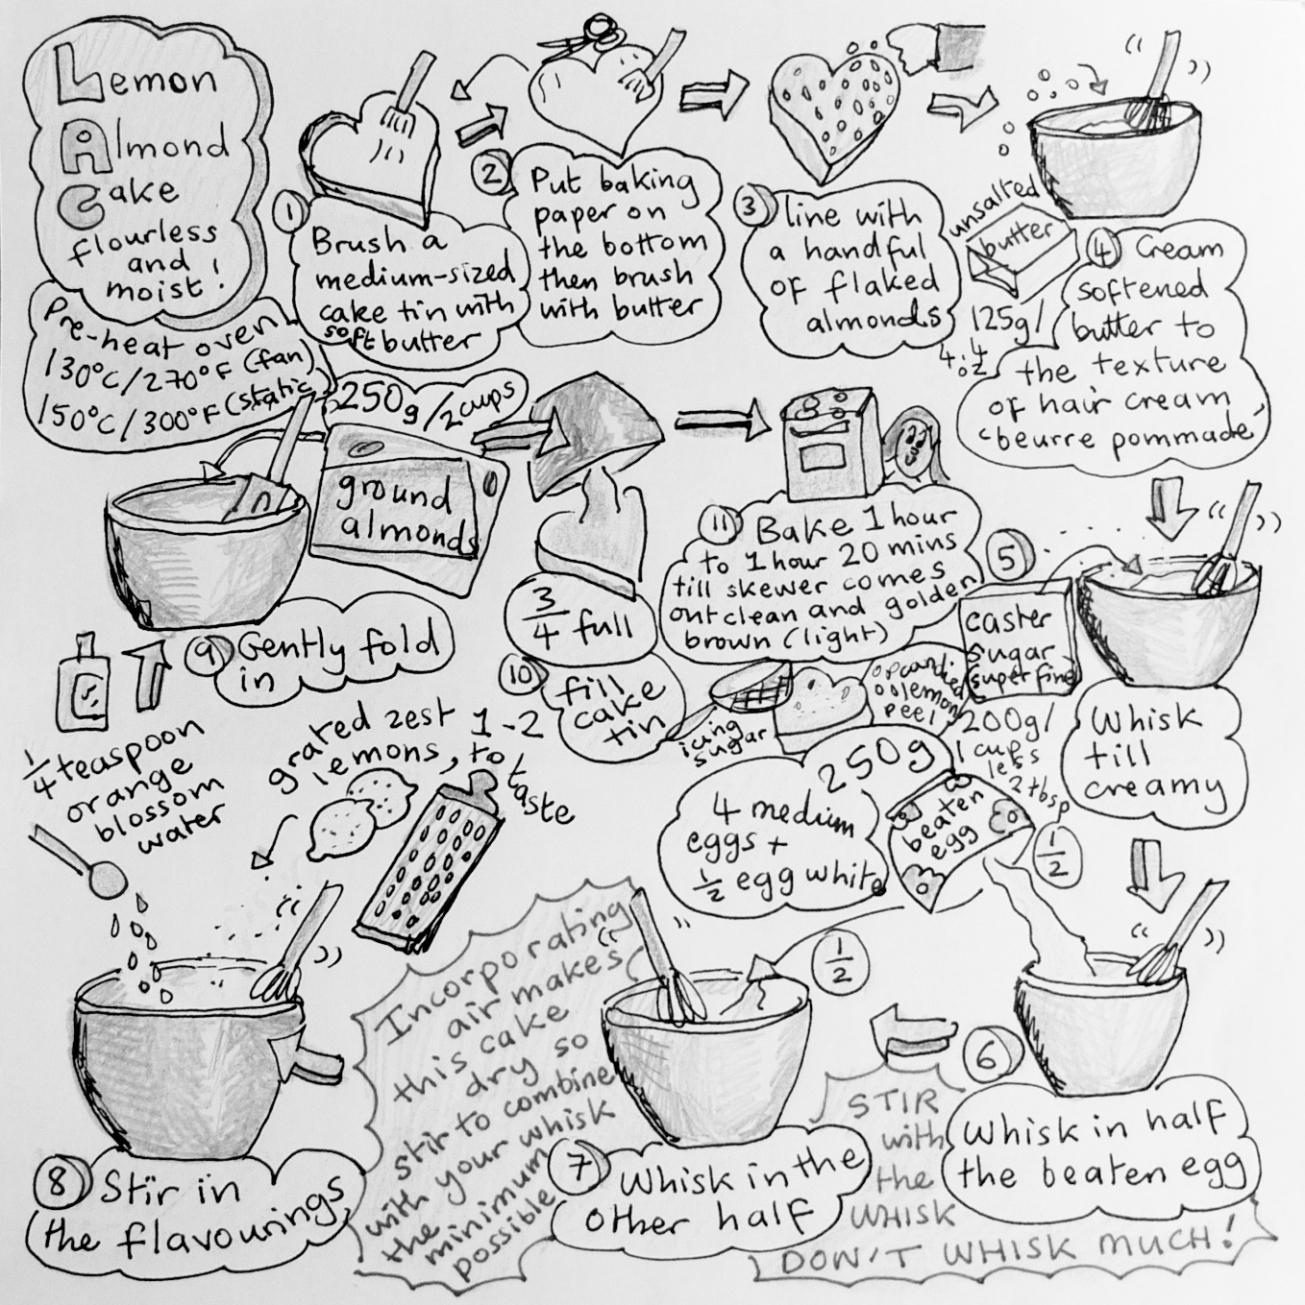 French flourless lemon almond cake - illustrated recipe